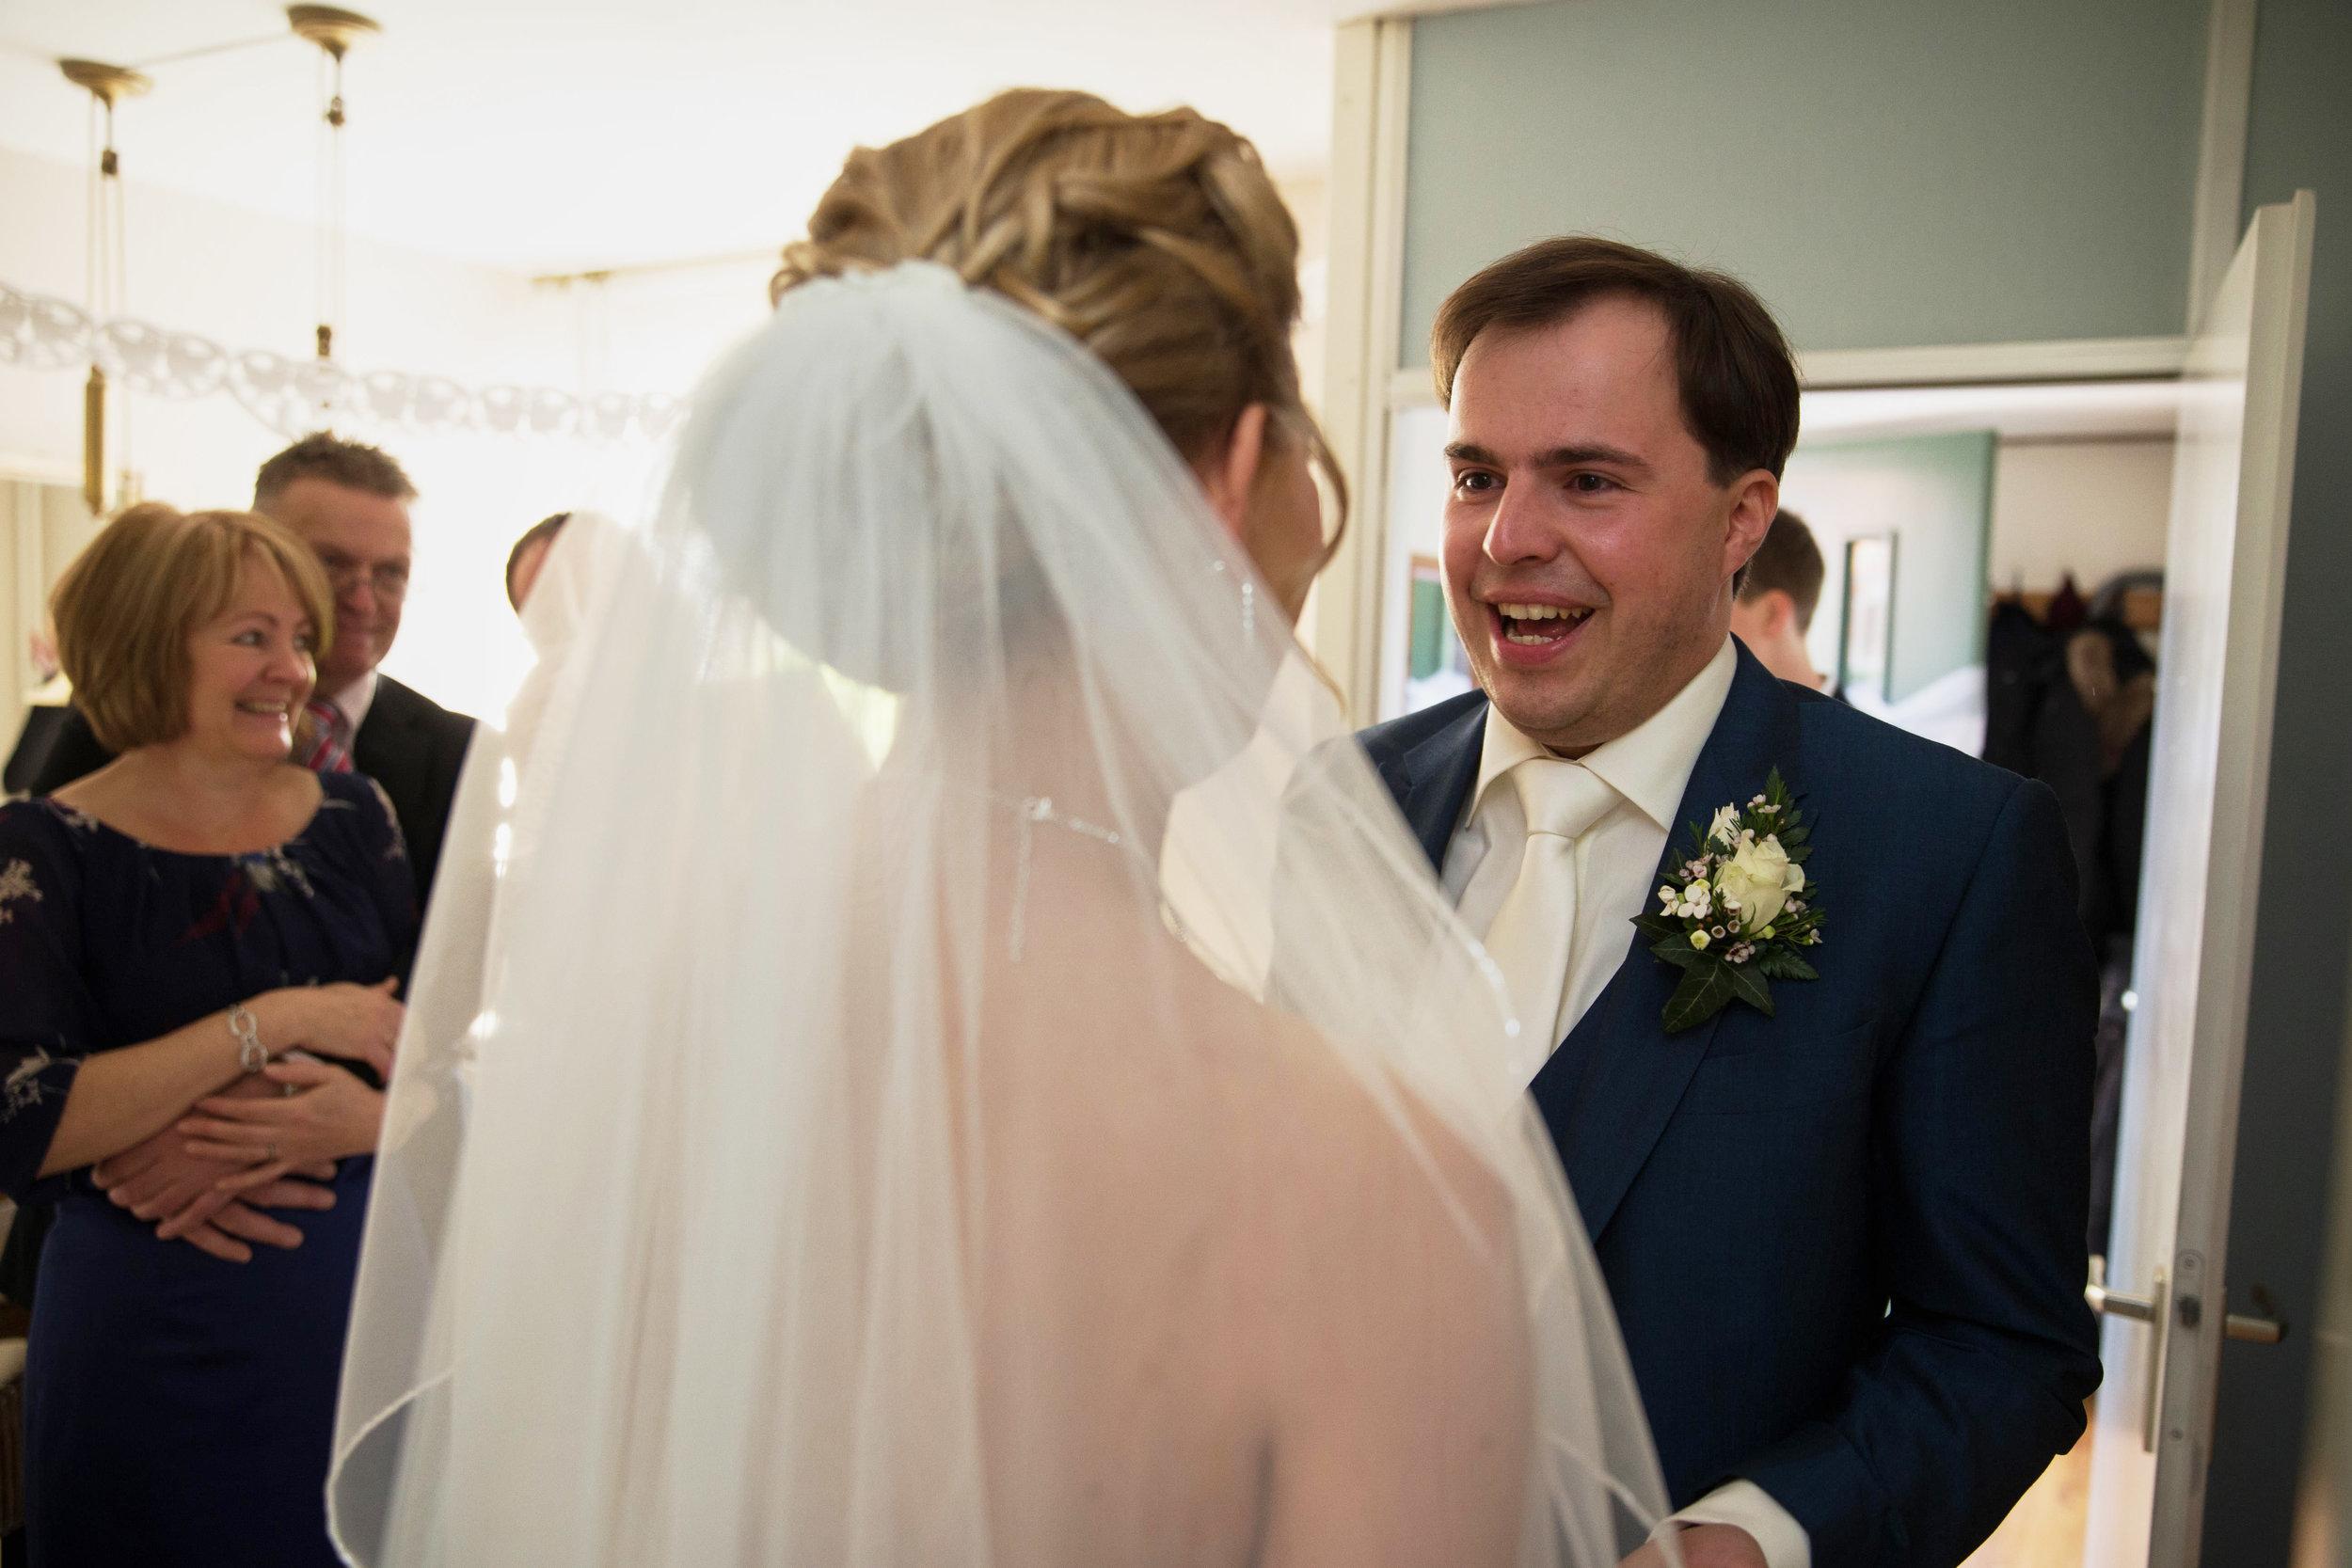 bruidsfotografie-trouwreprotage-huwelijksfotografie-bruidsfotograaf-feestfotografie-Danielle-Benjamin-02.jpg